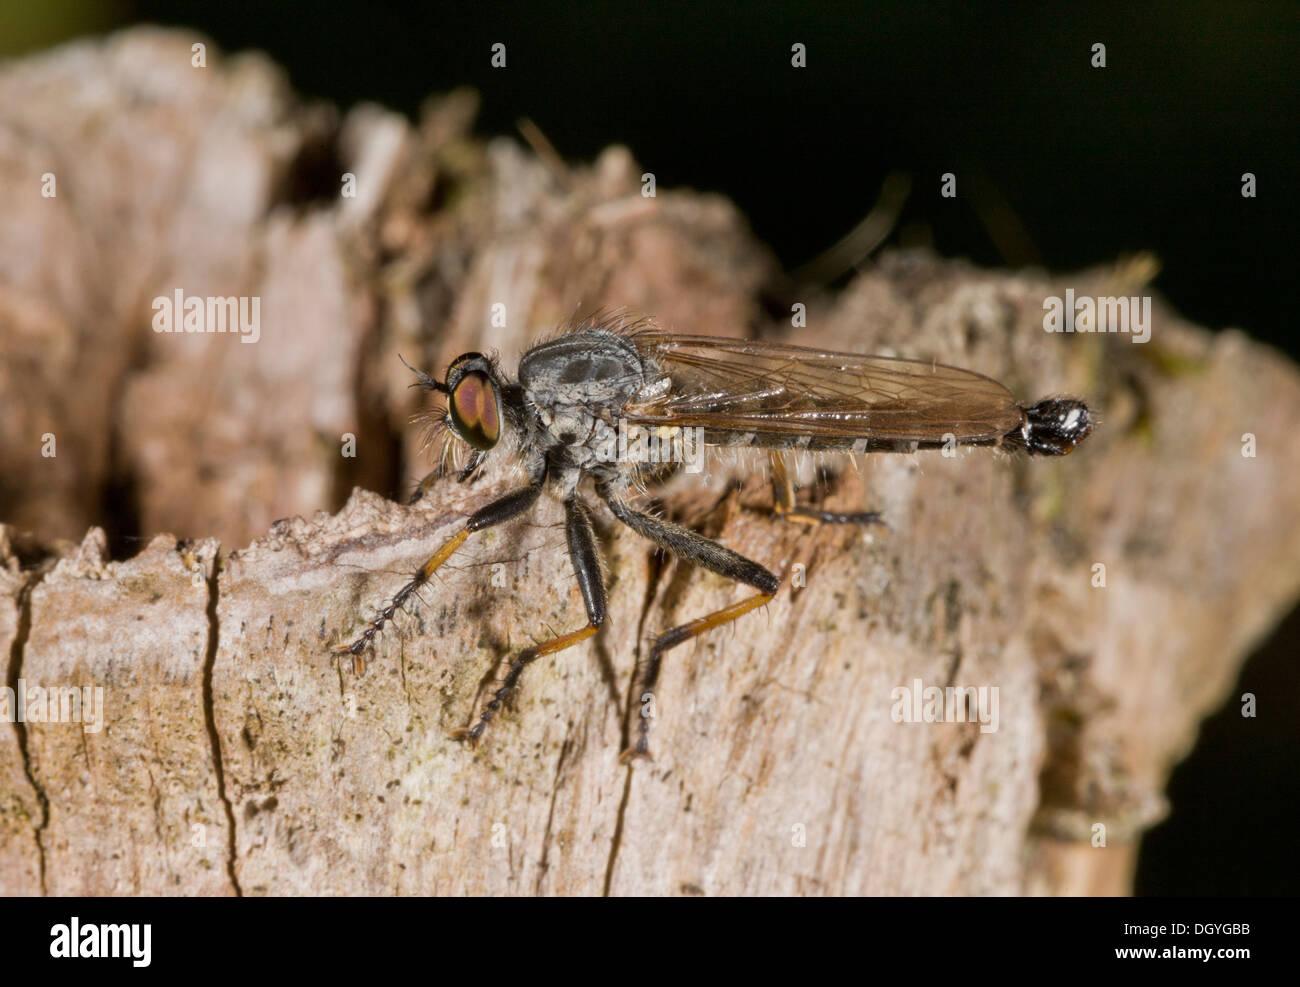 Common Awl Robber-fly, Neoitamus cyanurus - Stock Image